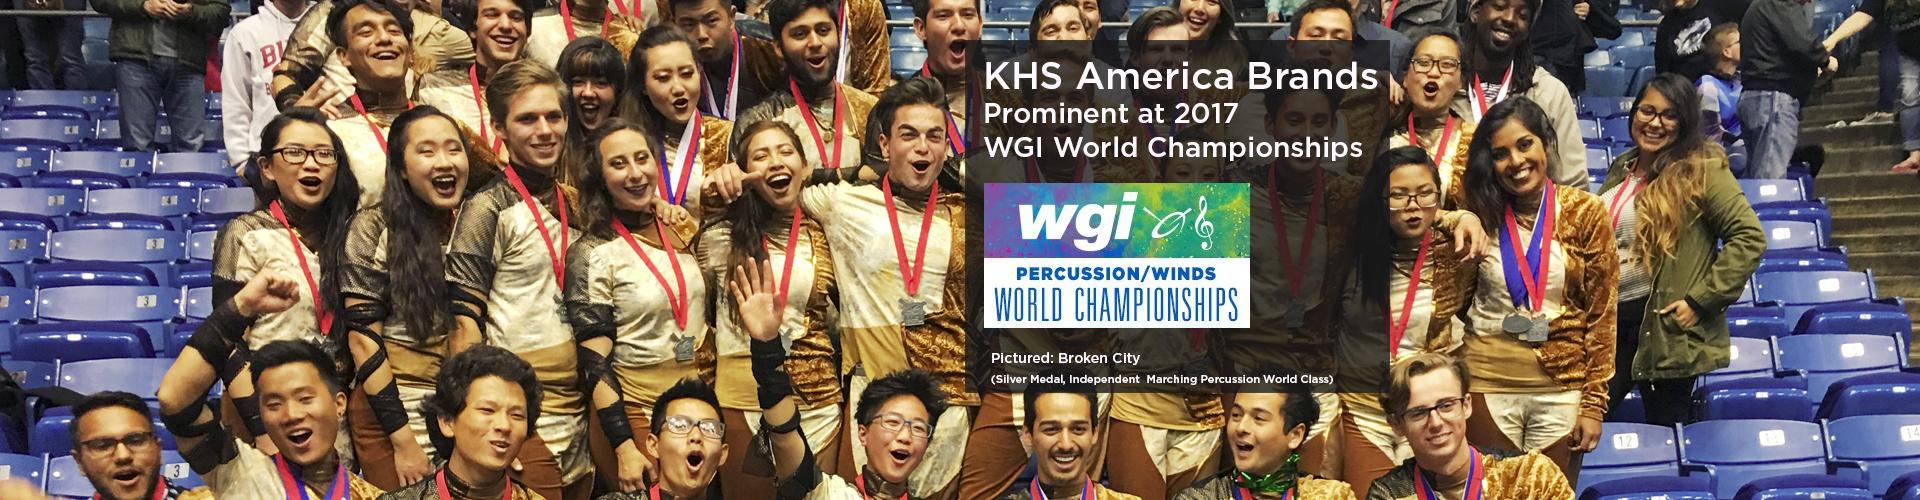 WGI World Championships